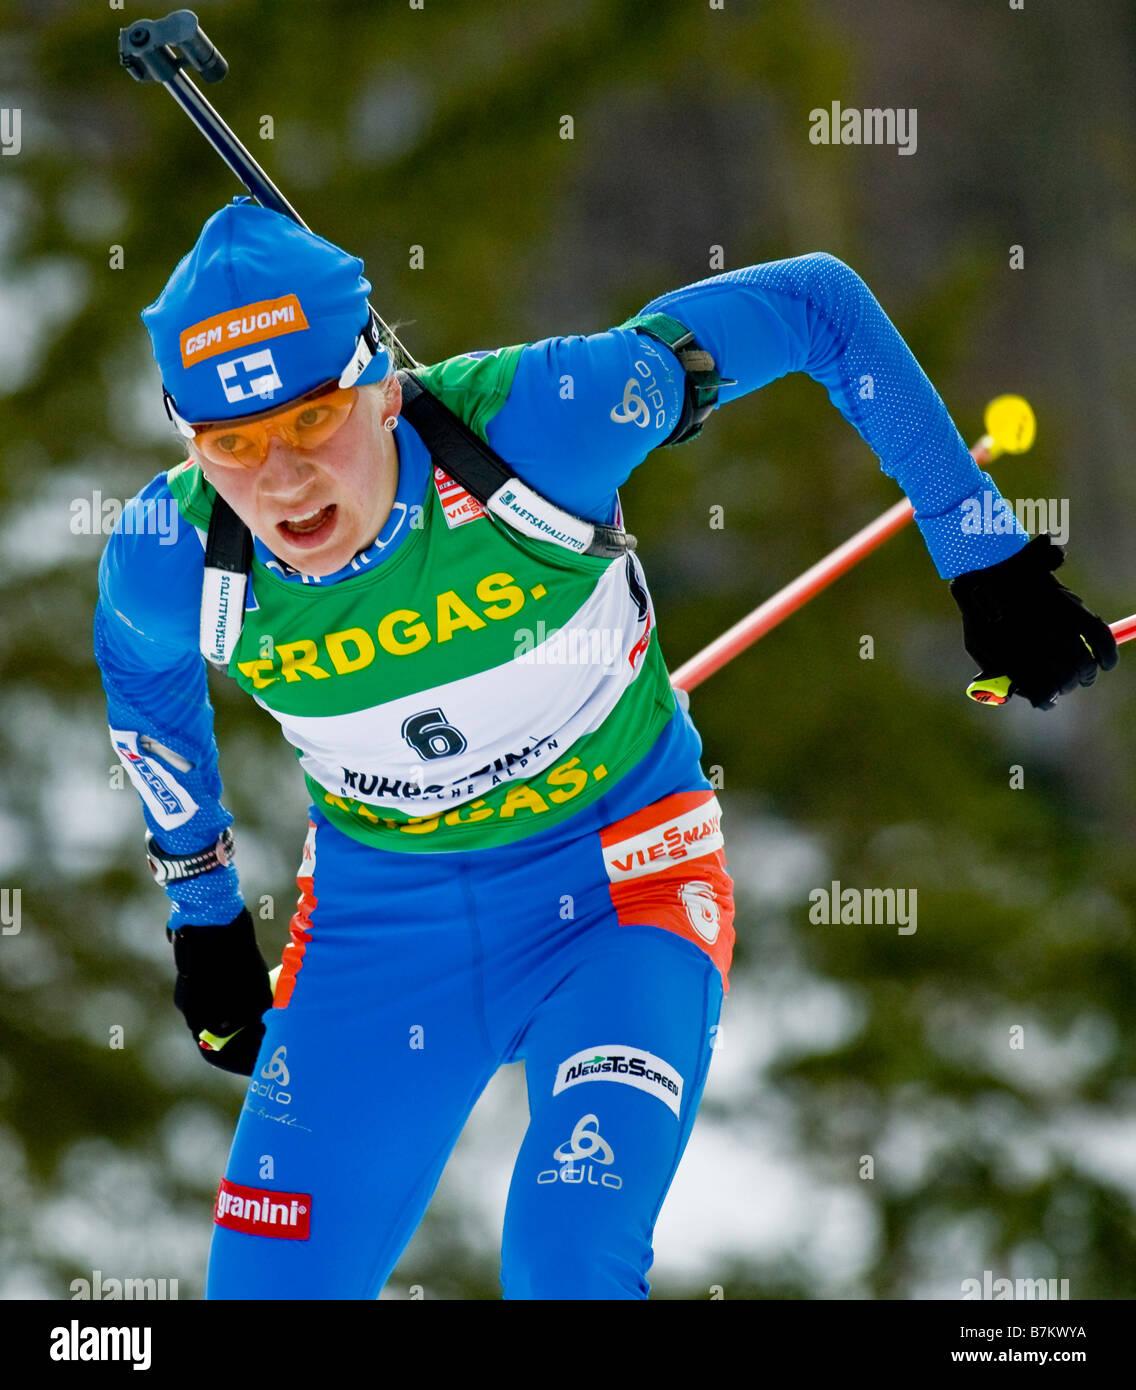 MÄKÄRÄINEN Kaisa Finnland Biathlon Weltcup Verfolgung Frauen M nner Ruhpolding 18 1 2009 - Stock Image